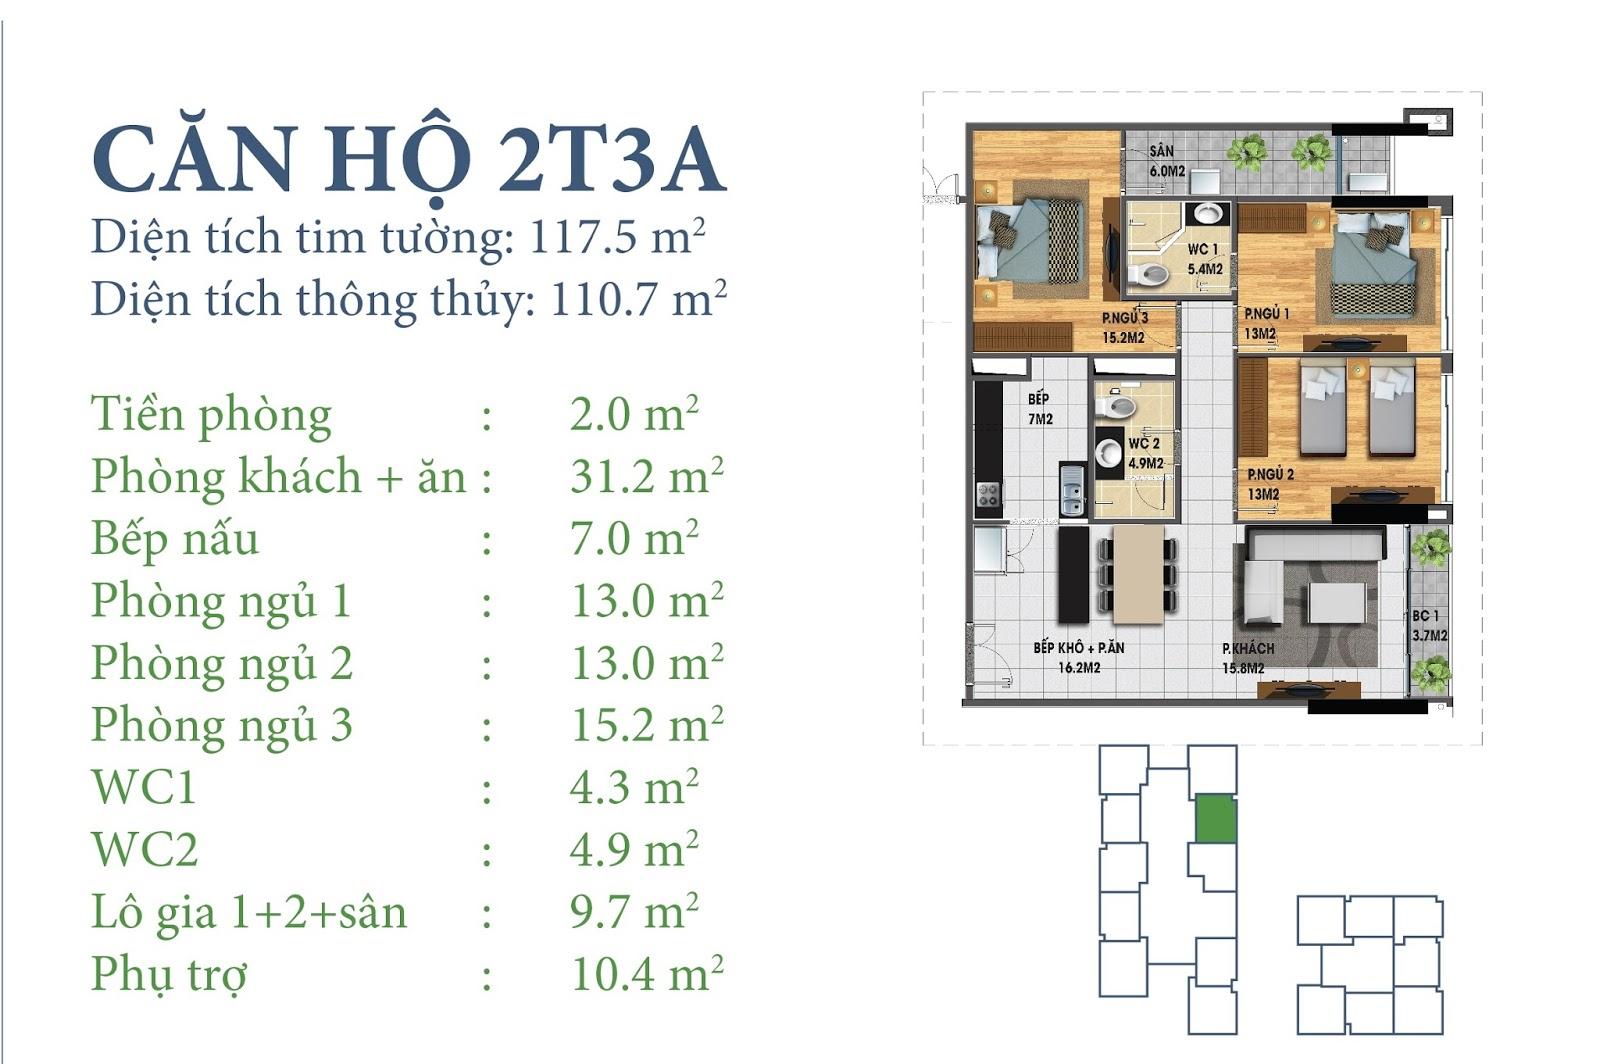 2T3A-horizon-tower-ngoai-giao-doan